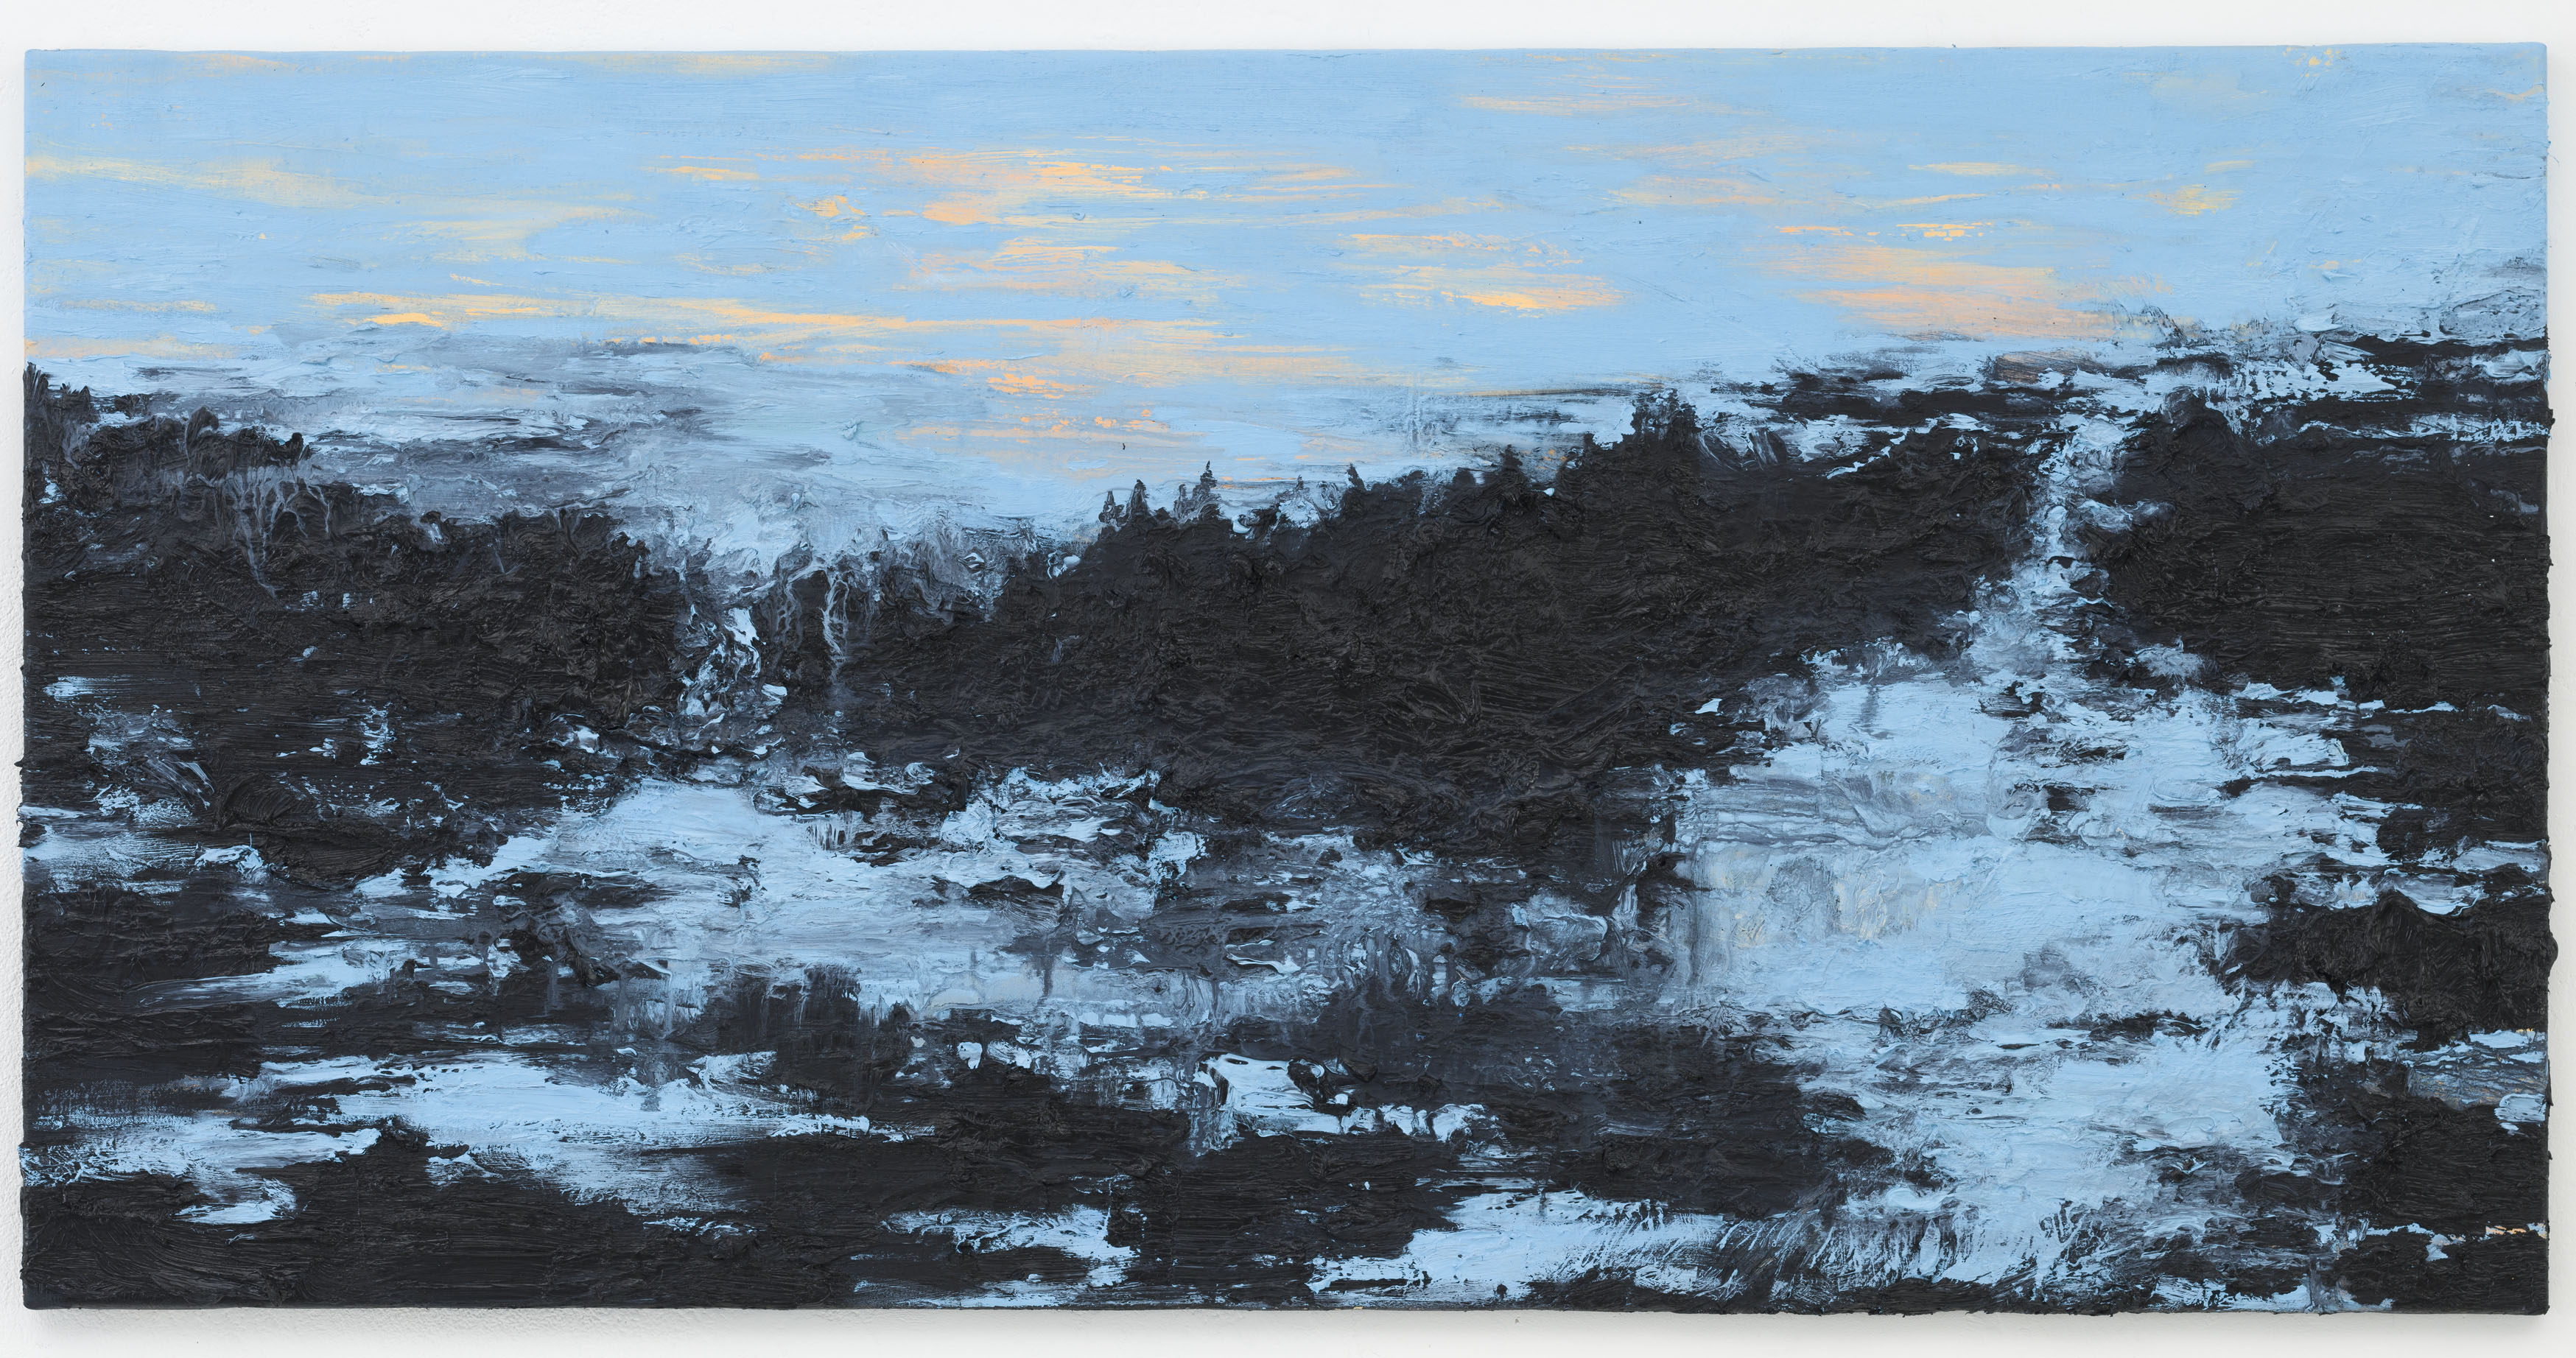 """Where the wild roses grow"" 70 x 140 cm. oil on linen 2012"